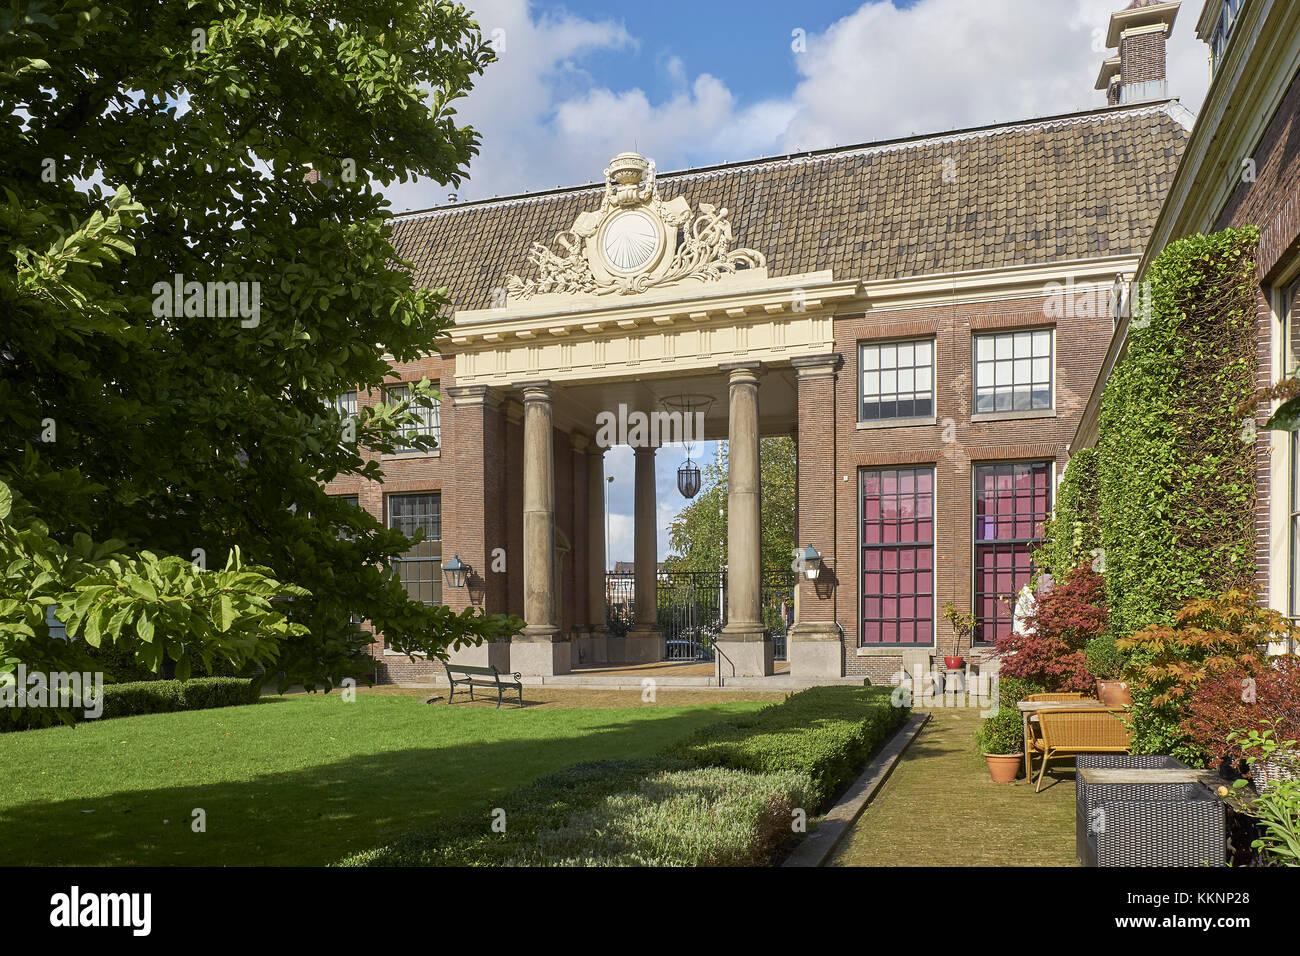 Teylers Hofje, Haarlem, North Holland, Netherlands - Stock Image